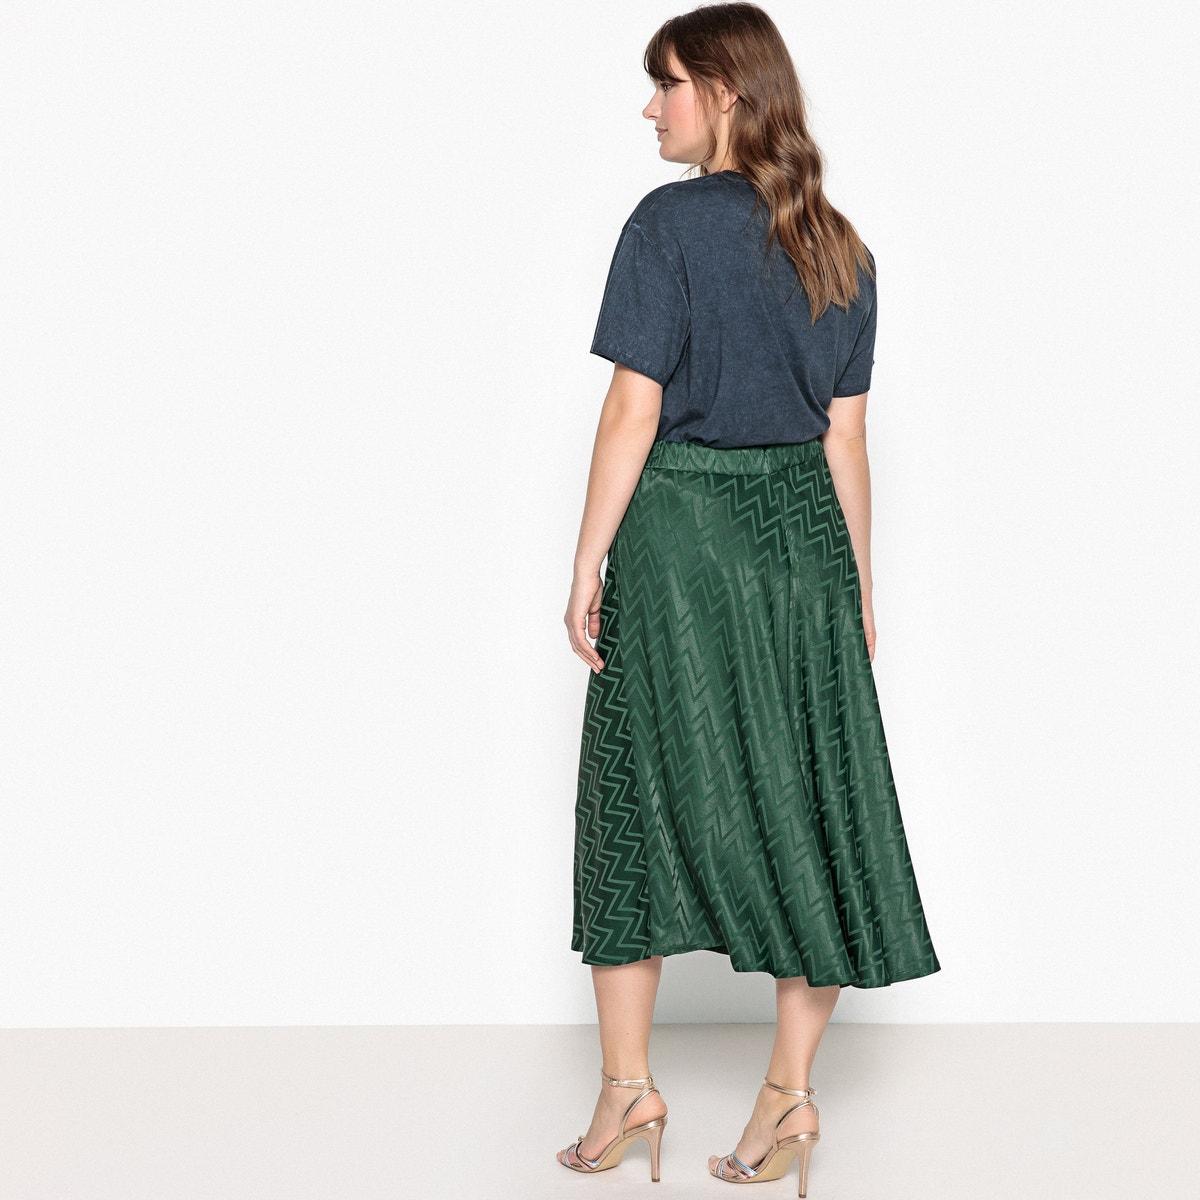 1d048d978d8 Castaluna Womens Zig Zag Patterned Midi Skirt Nbsp